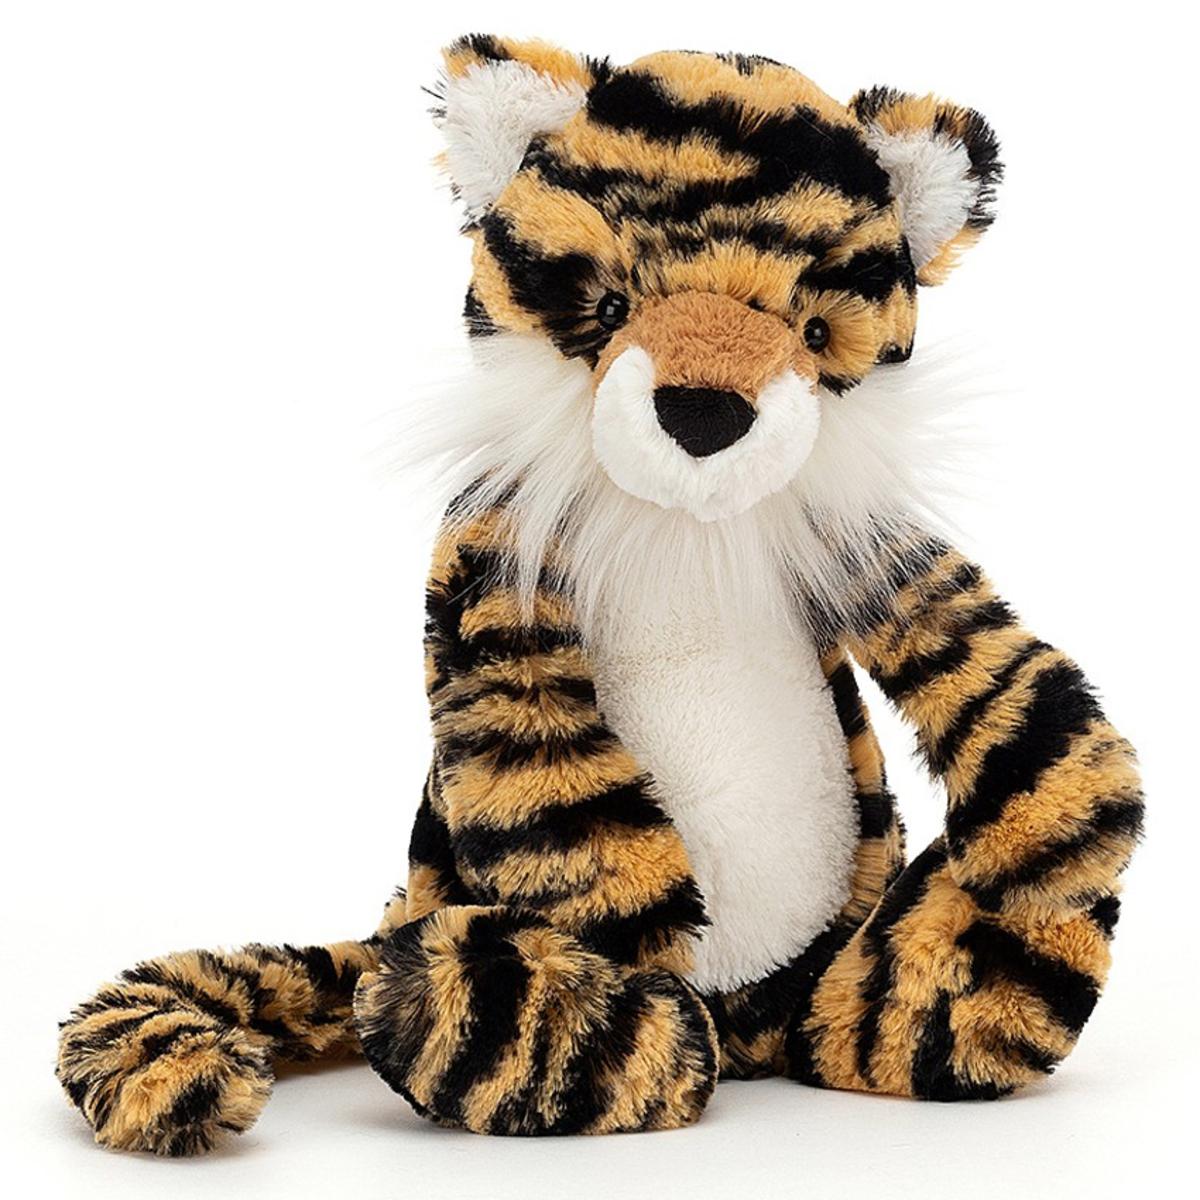 Peluche Bashful Tiger - Medium Peluche Tigre 31 cm